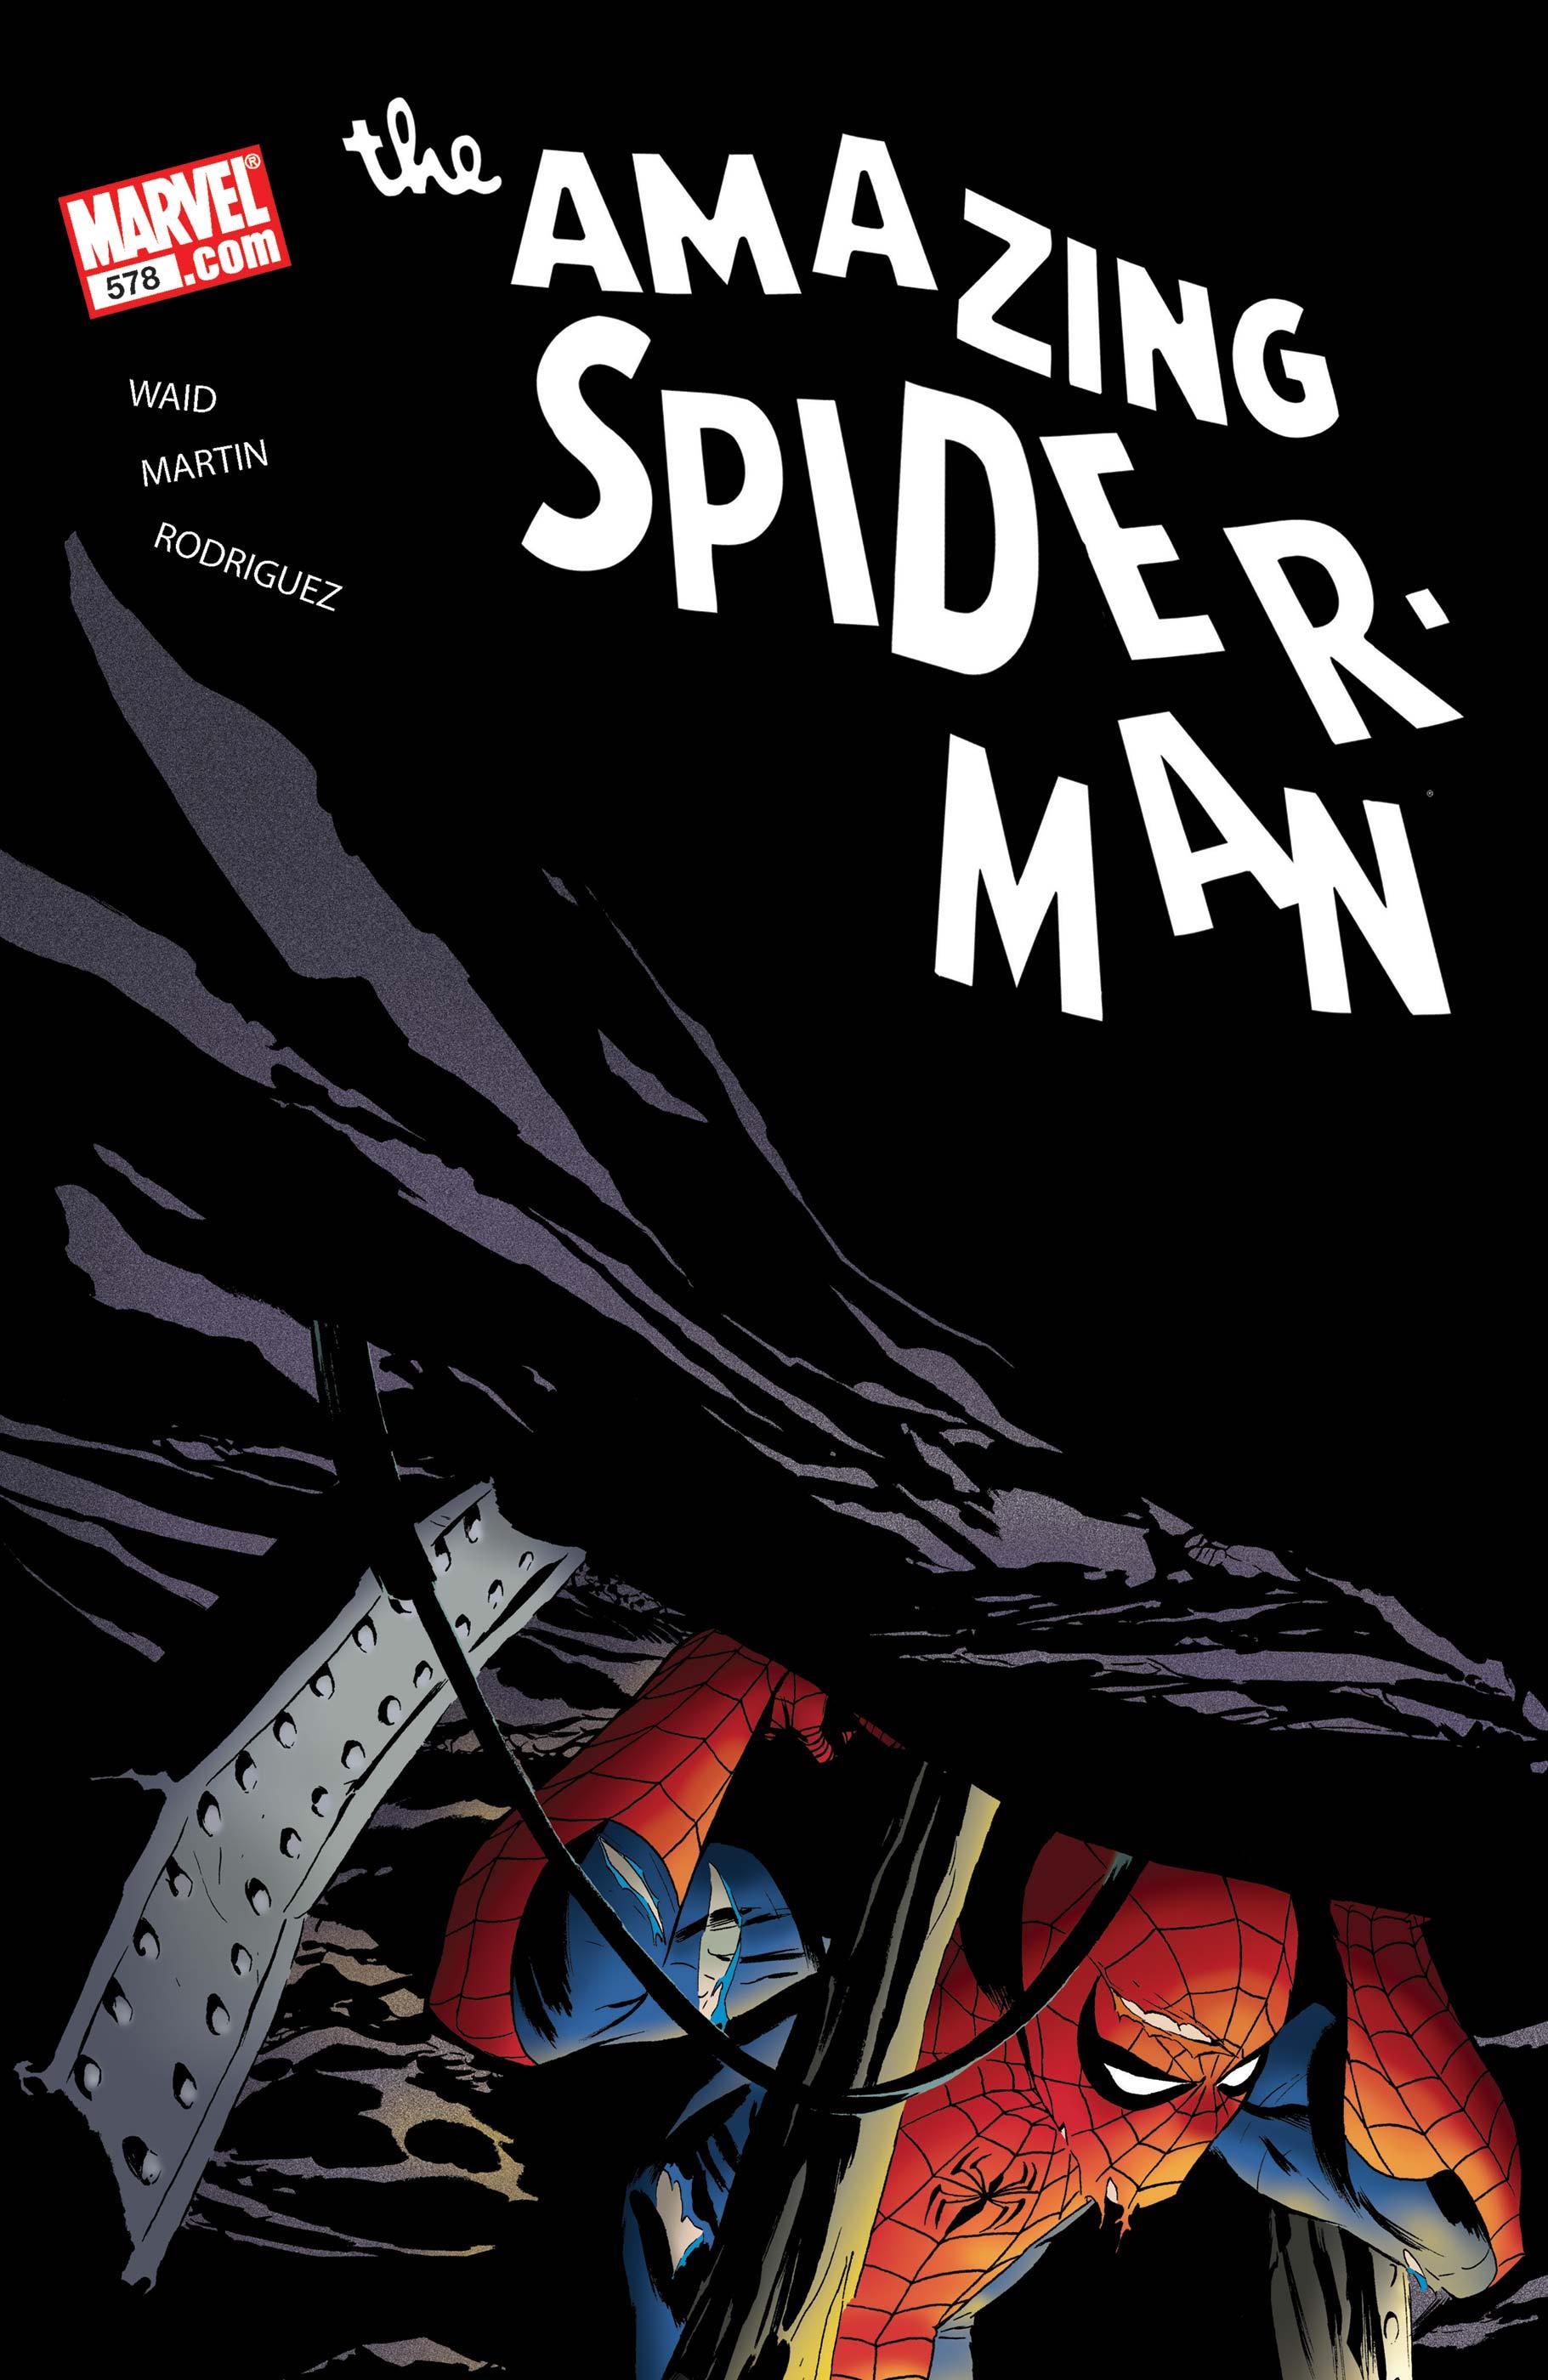 Marvel Comics AMAZING SPIDER-MAN #579 Mark Waid 2008